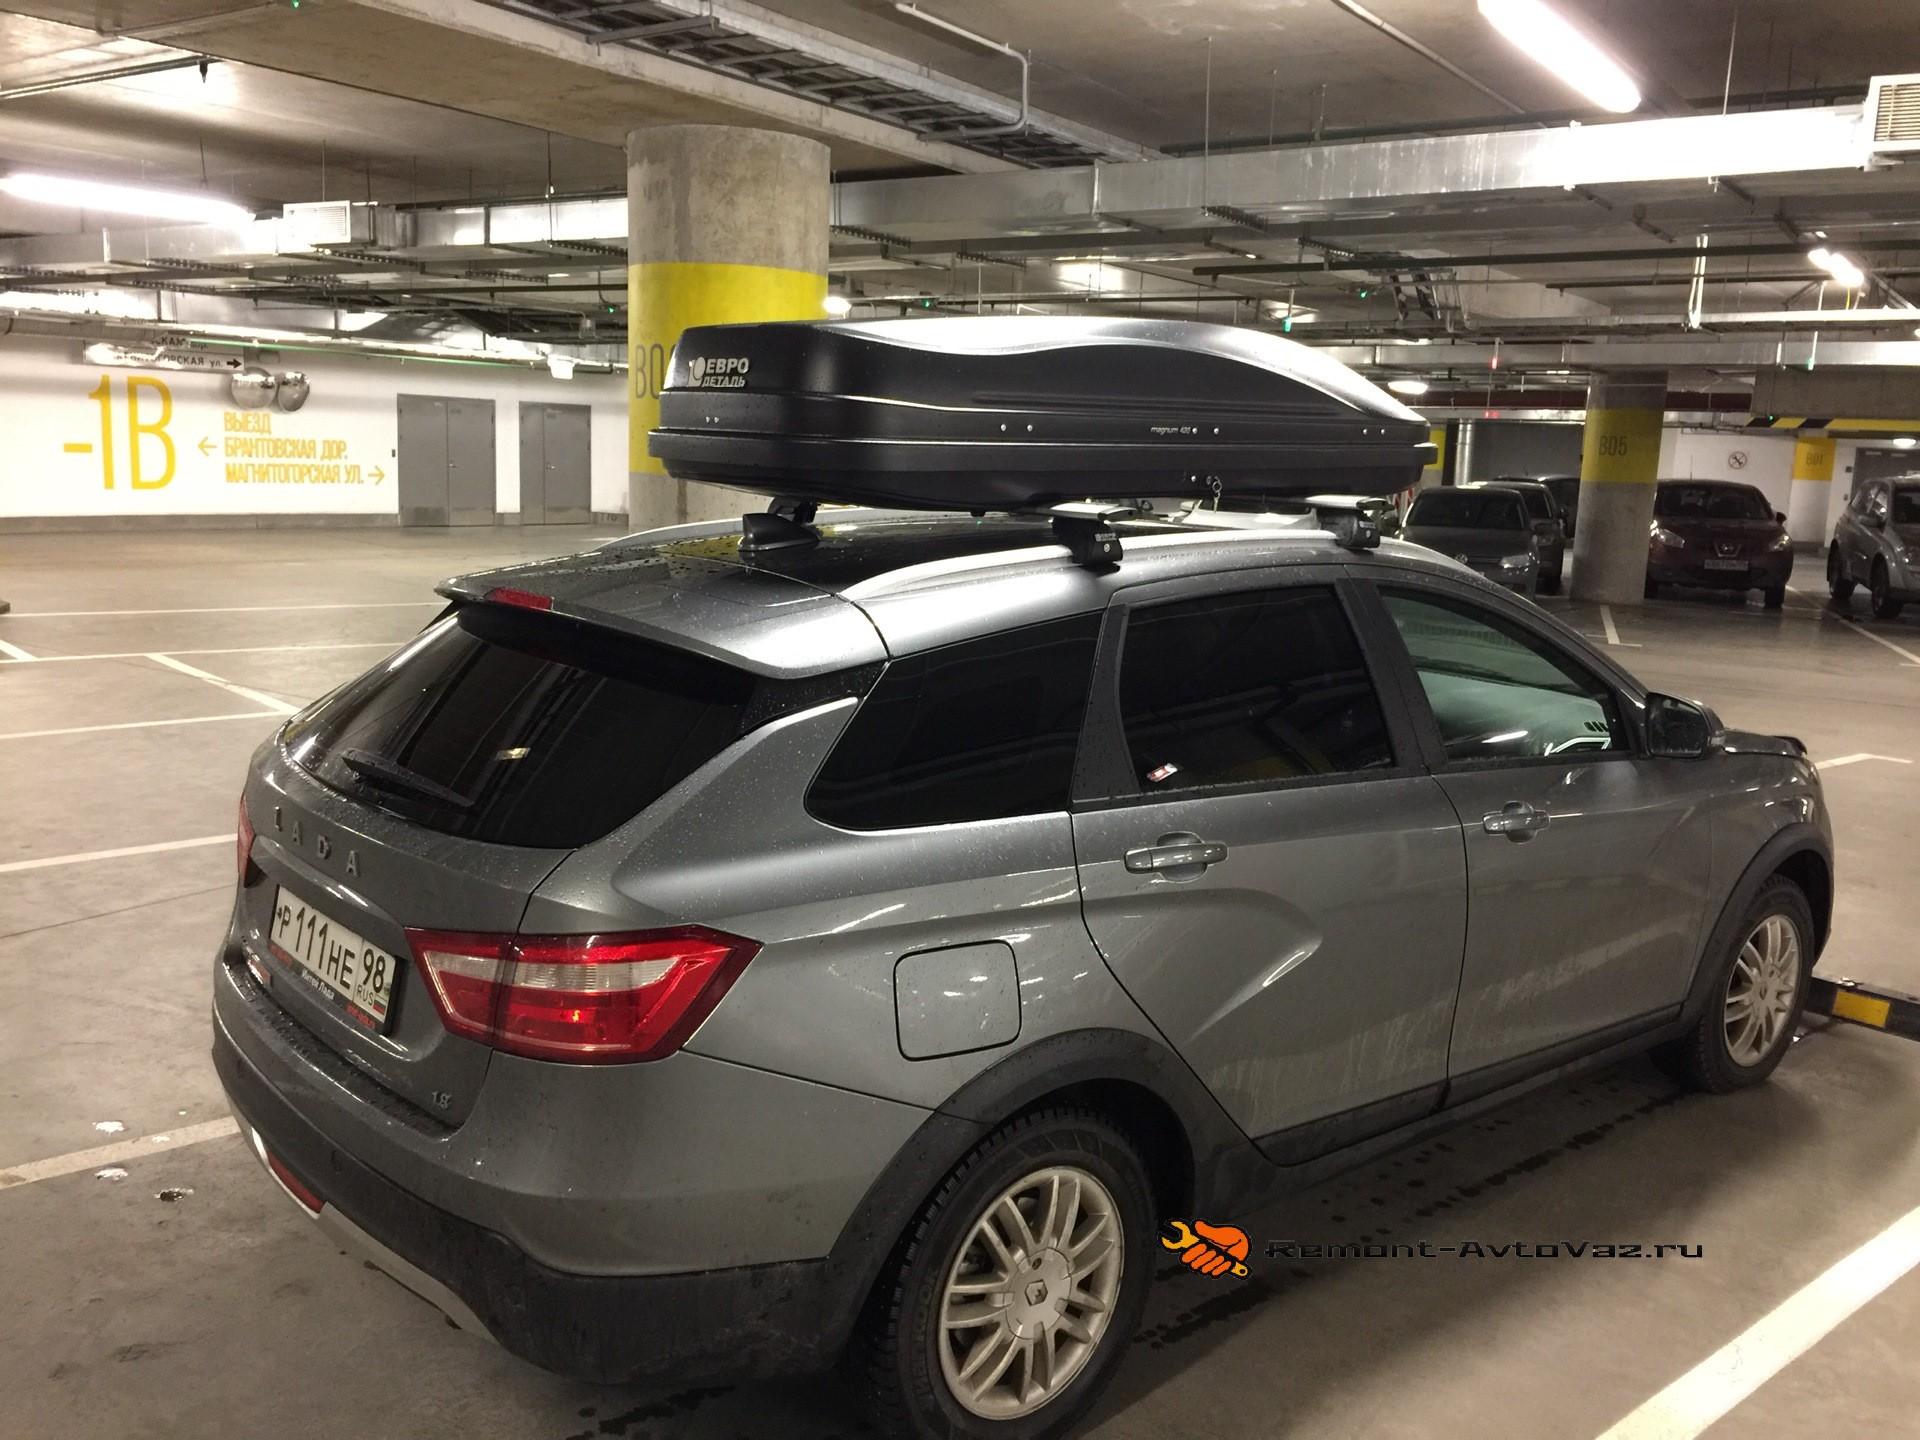 Багажник на крышу Веста Лада